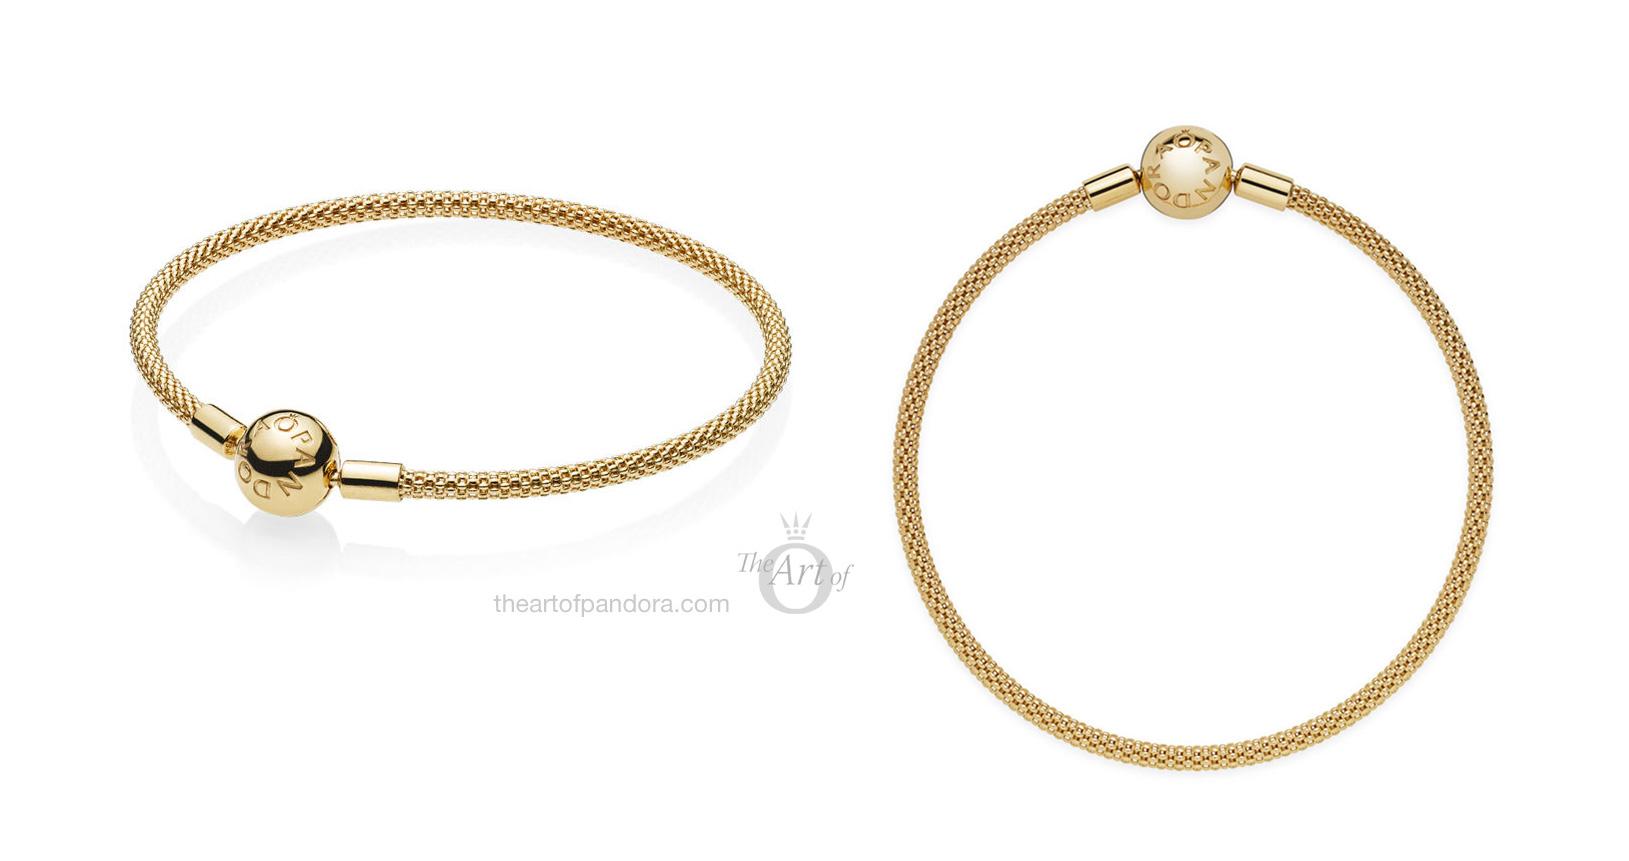 652025ff9 PANDORA-Shine-Mesh-Bracelet-566543 - The Art of Pandora | More than ...